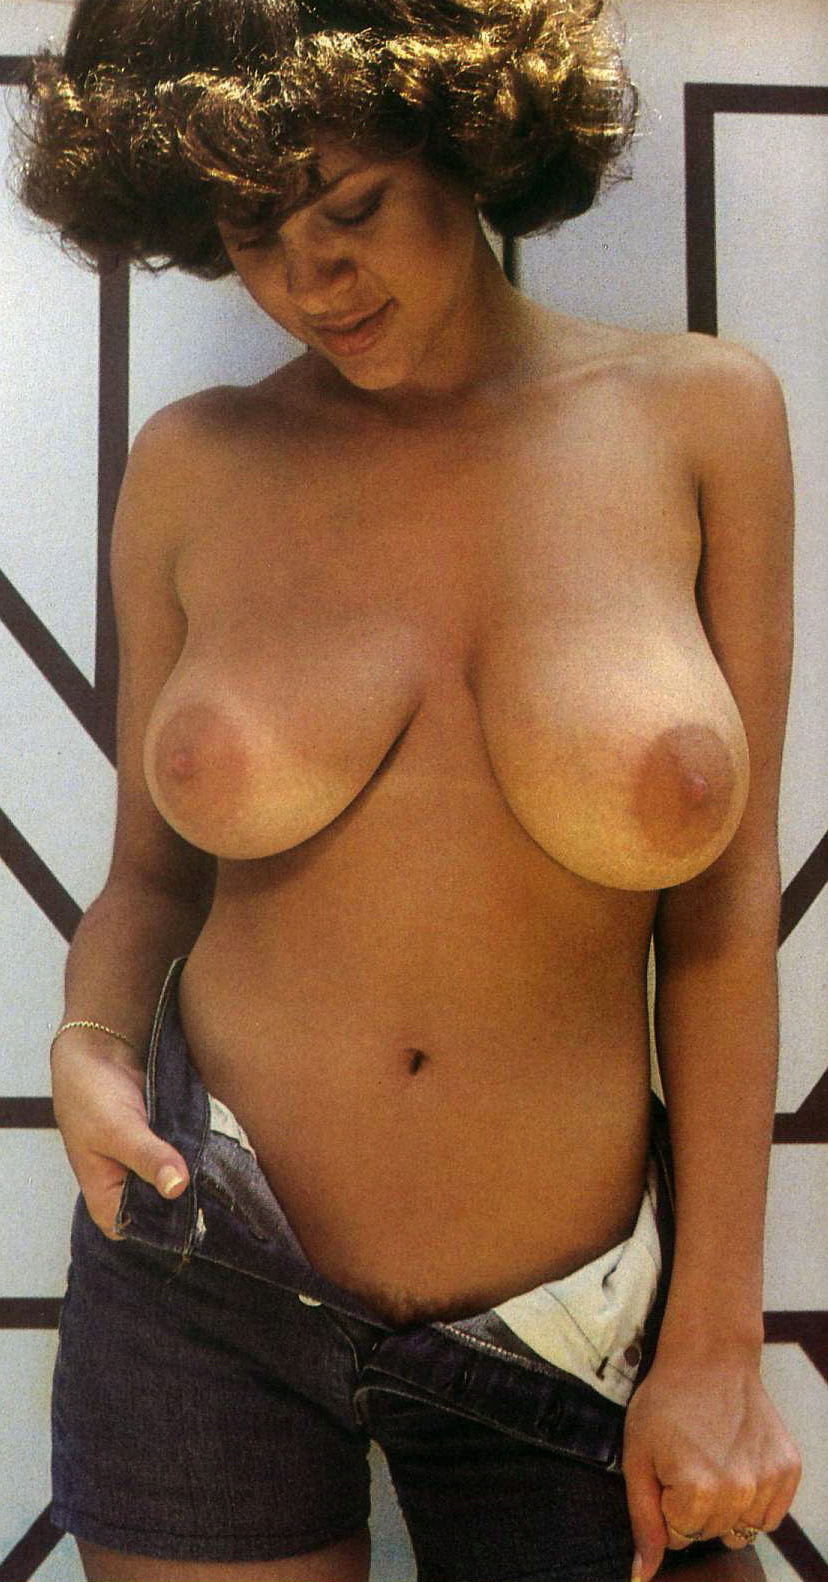 keli-stewart-uneven-boobs